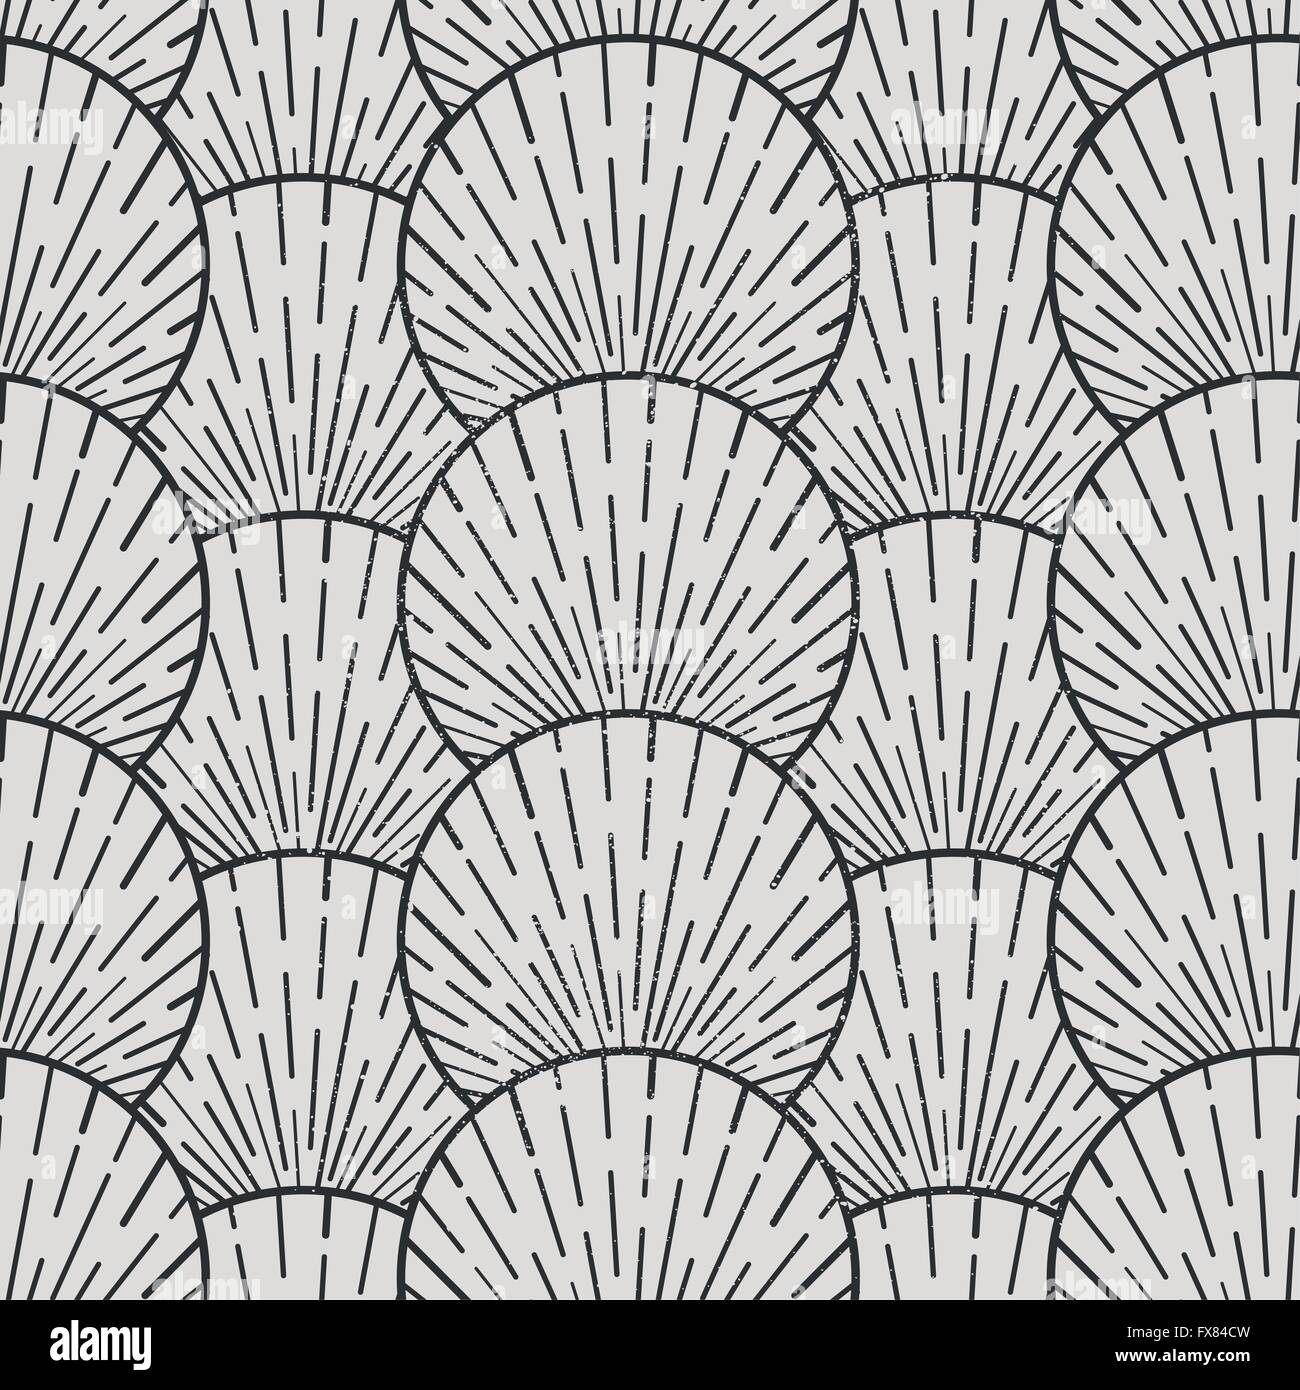 Nahtlose Vektormuster. Nahtlose geometrische Muster, Vektor-illustration Stock Vektor